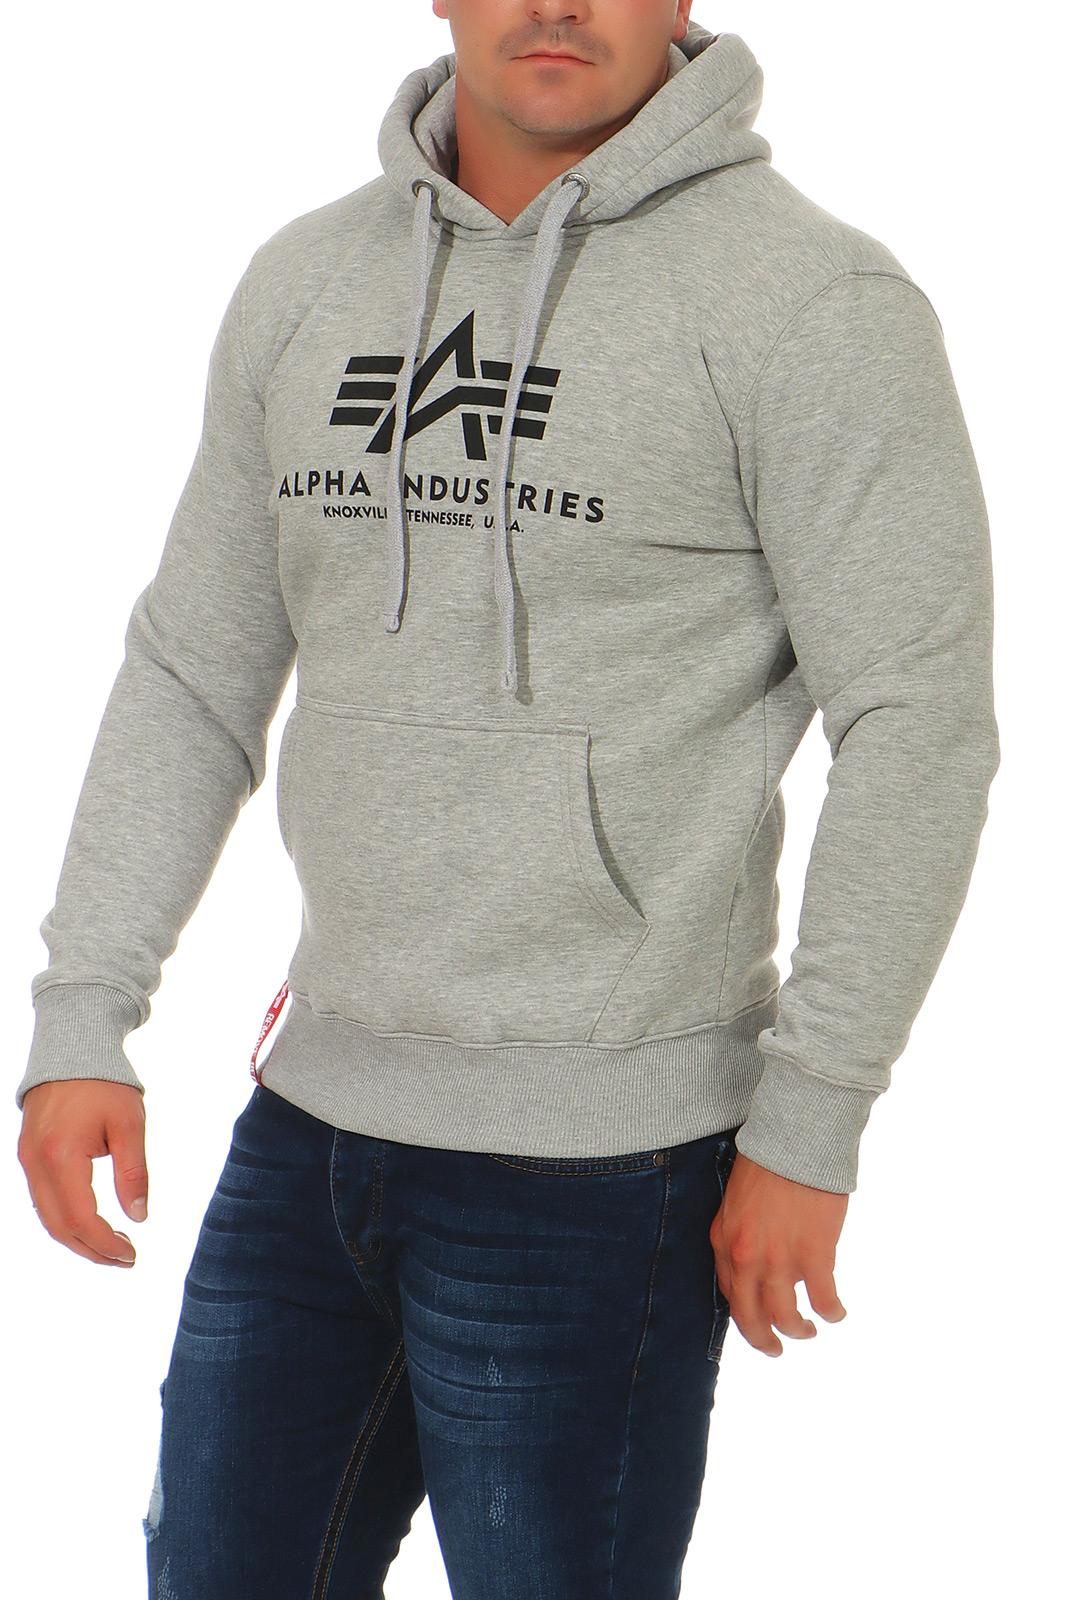 Alpha-Industries-Uomo-Hoody-Pullover-Basic-sweater-NUOVO-178312-hoodie-s-3xl miniatura 5